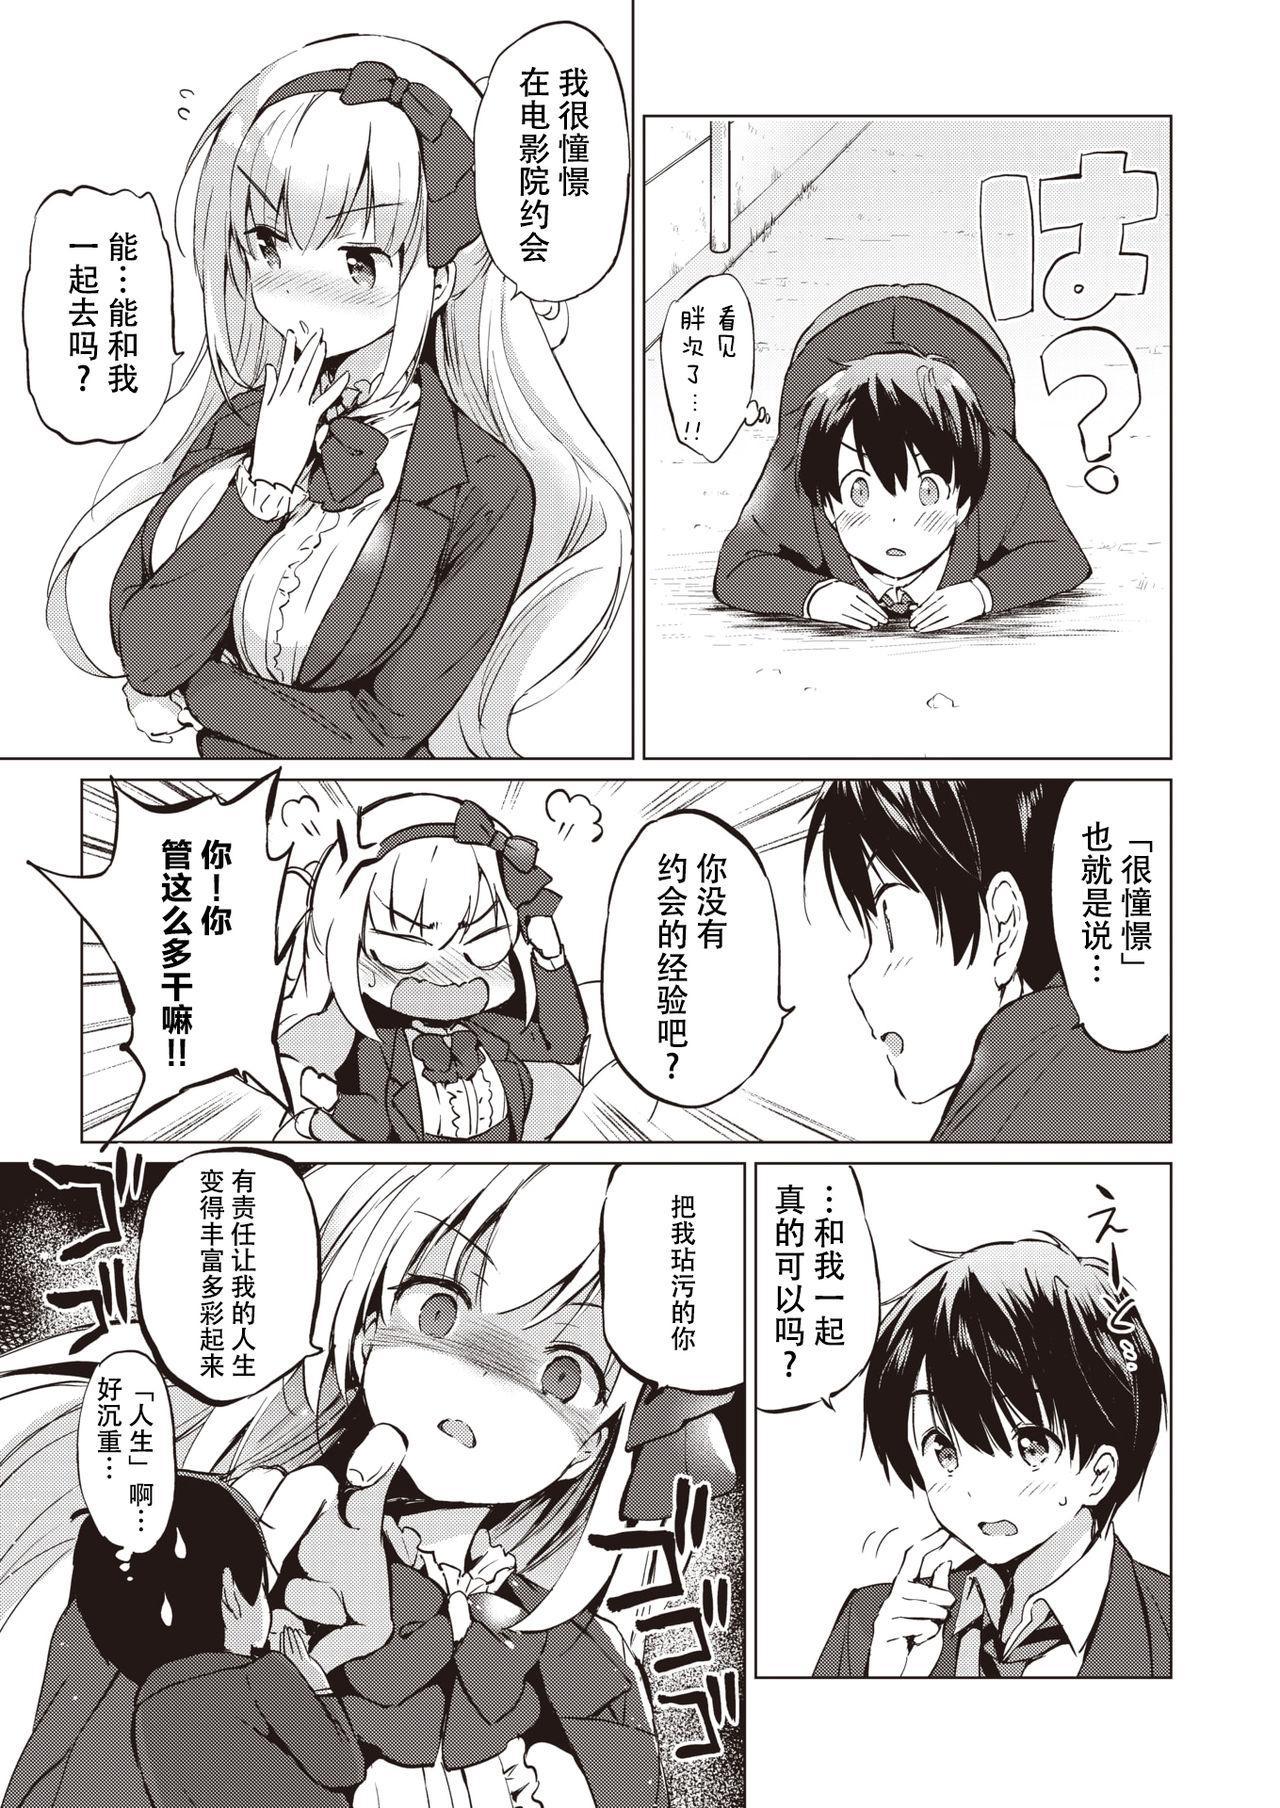 [Kurimomo (Tsukako)]sekigaharasann shiri-zu Ch. 1-3 (COMIC Kairakuten BEAST ) [鬼畜王汉化组][DL版] 18